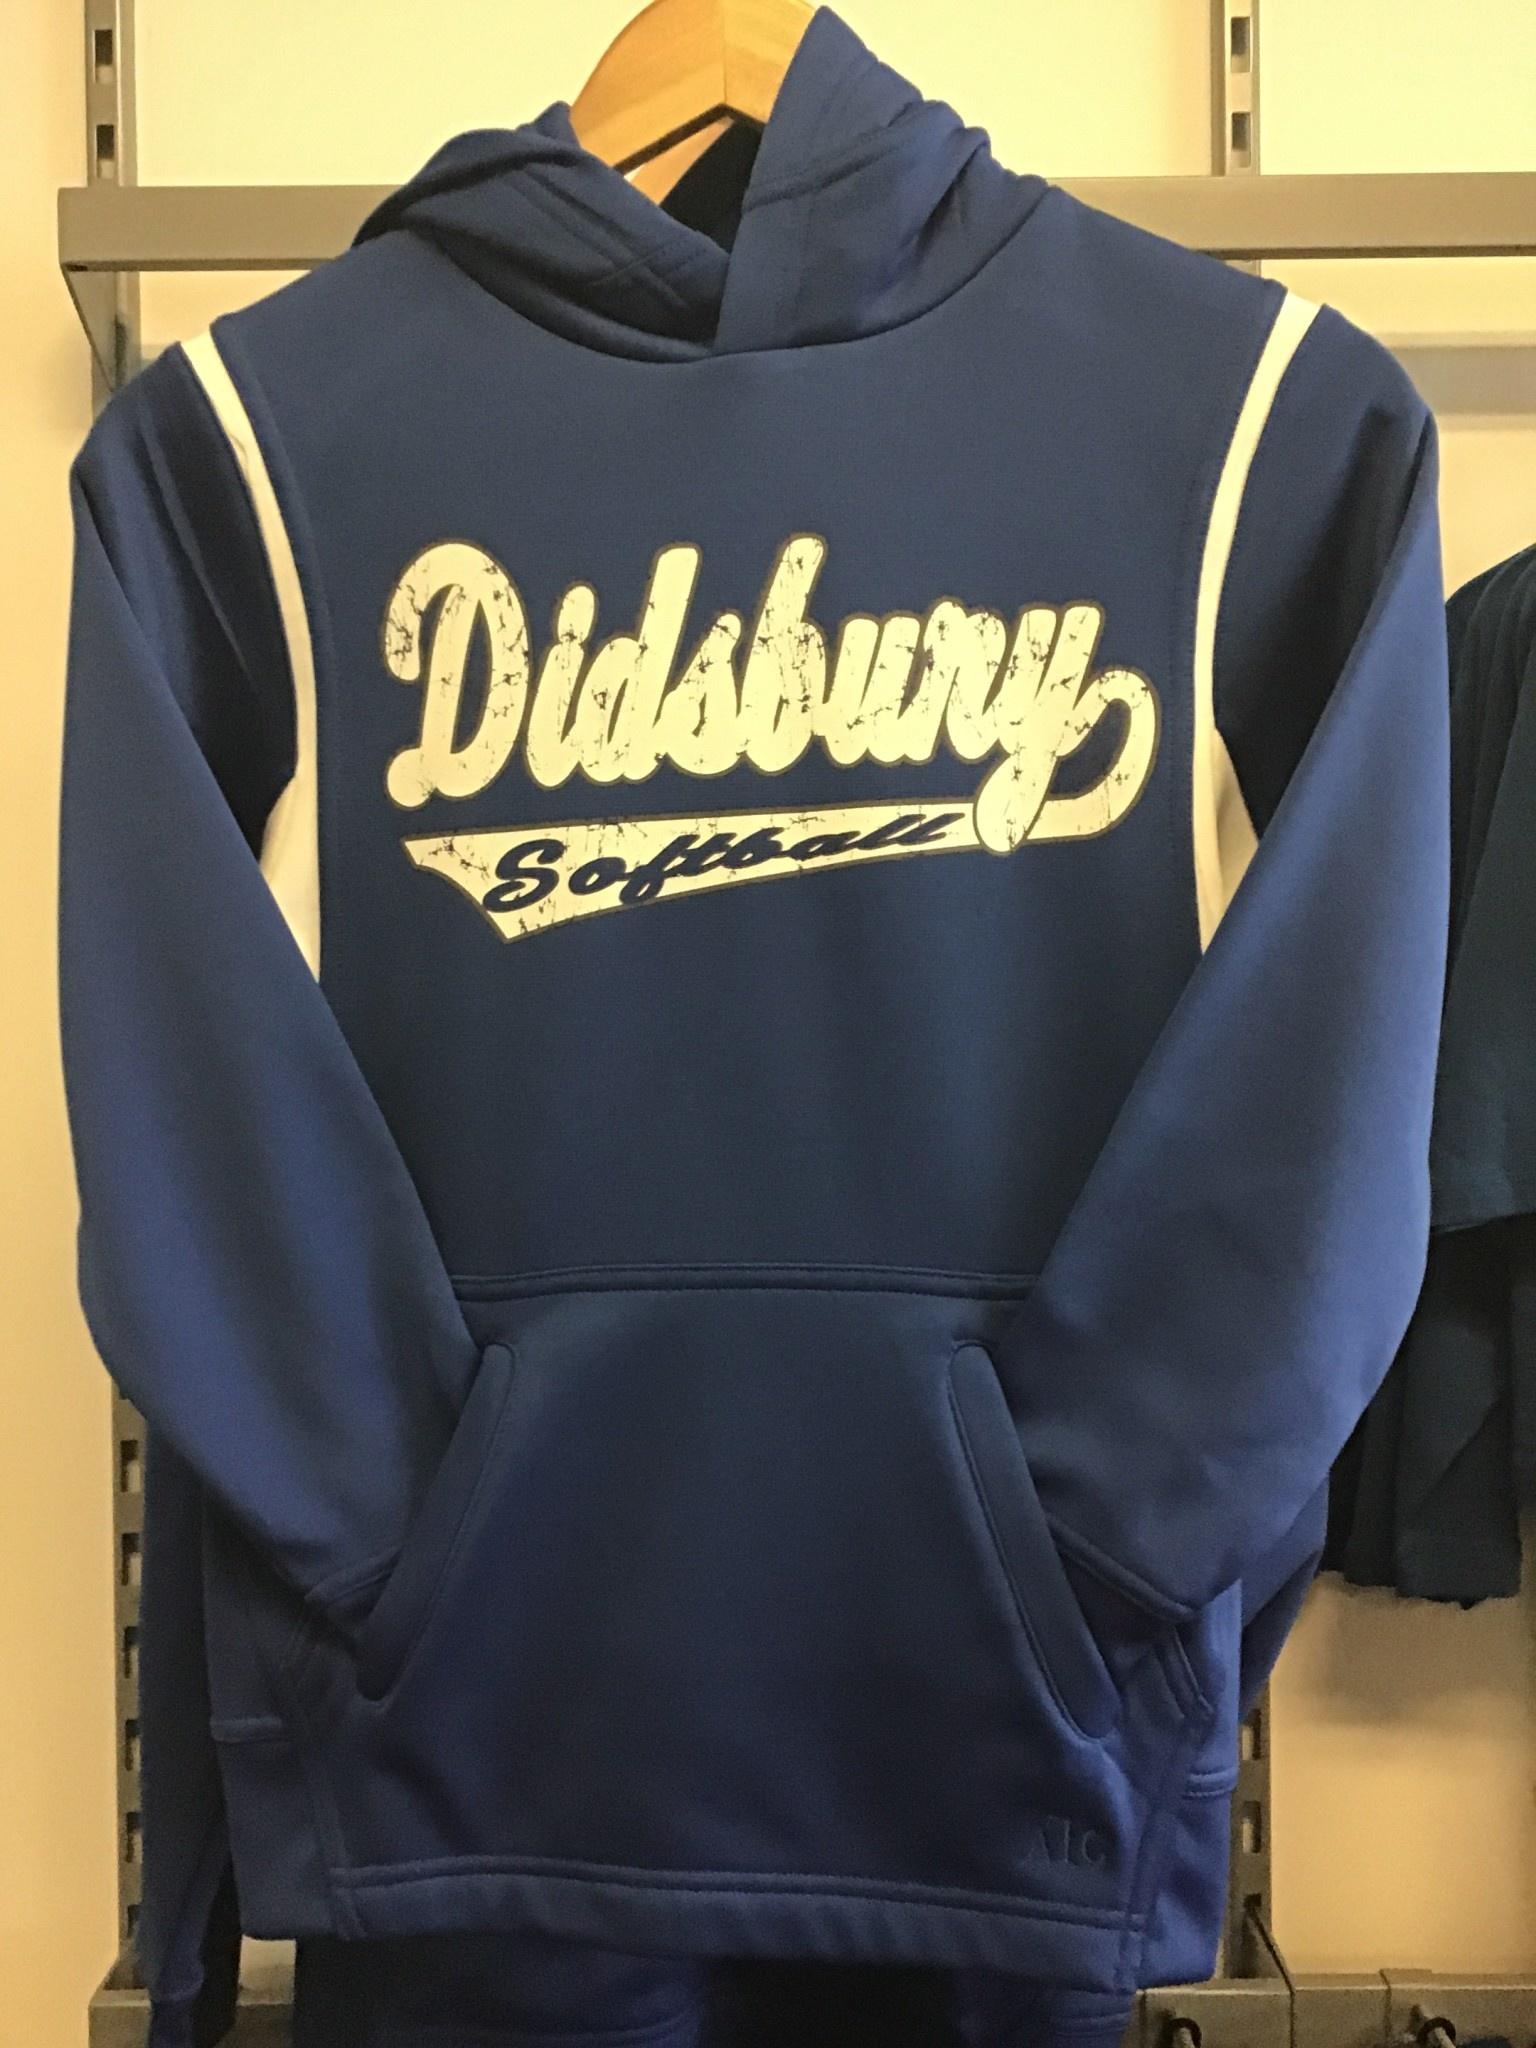 Didsbury Softball Hoodie